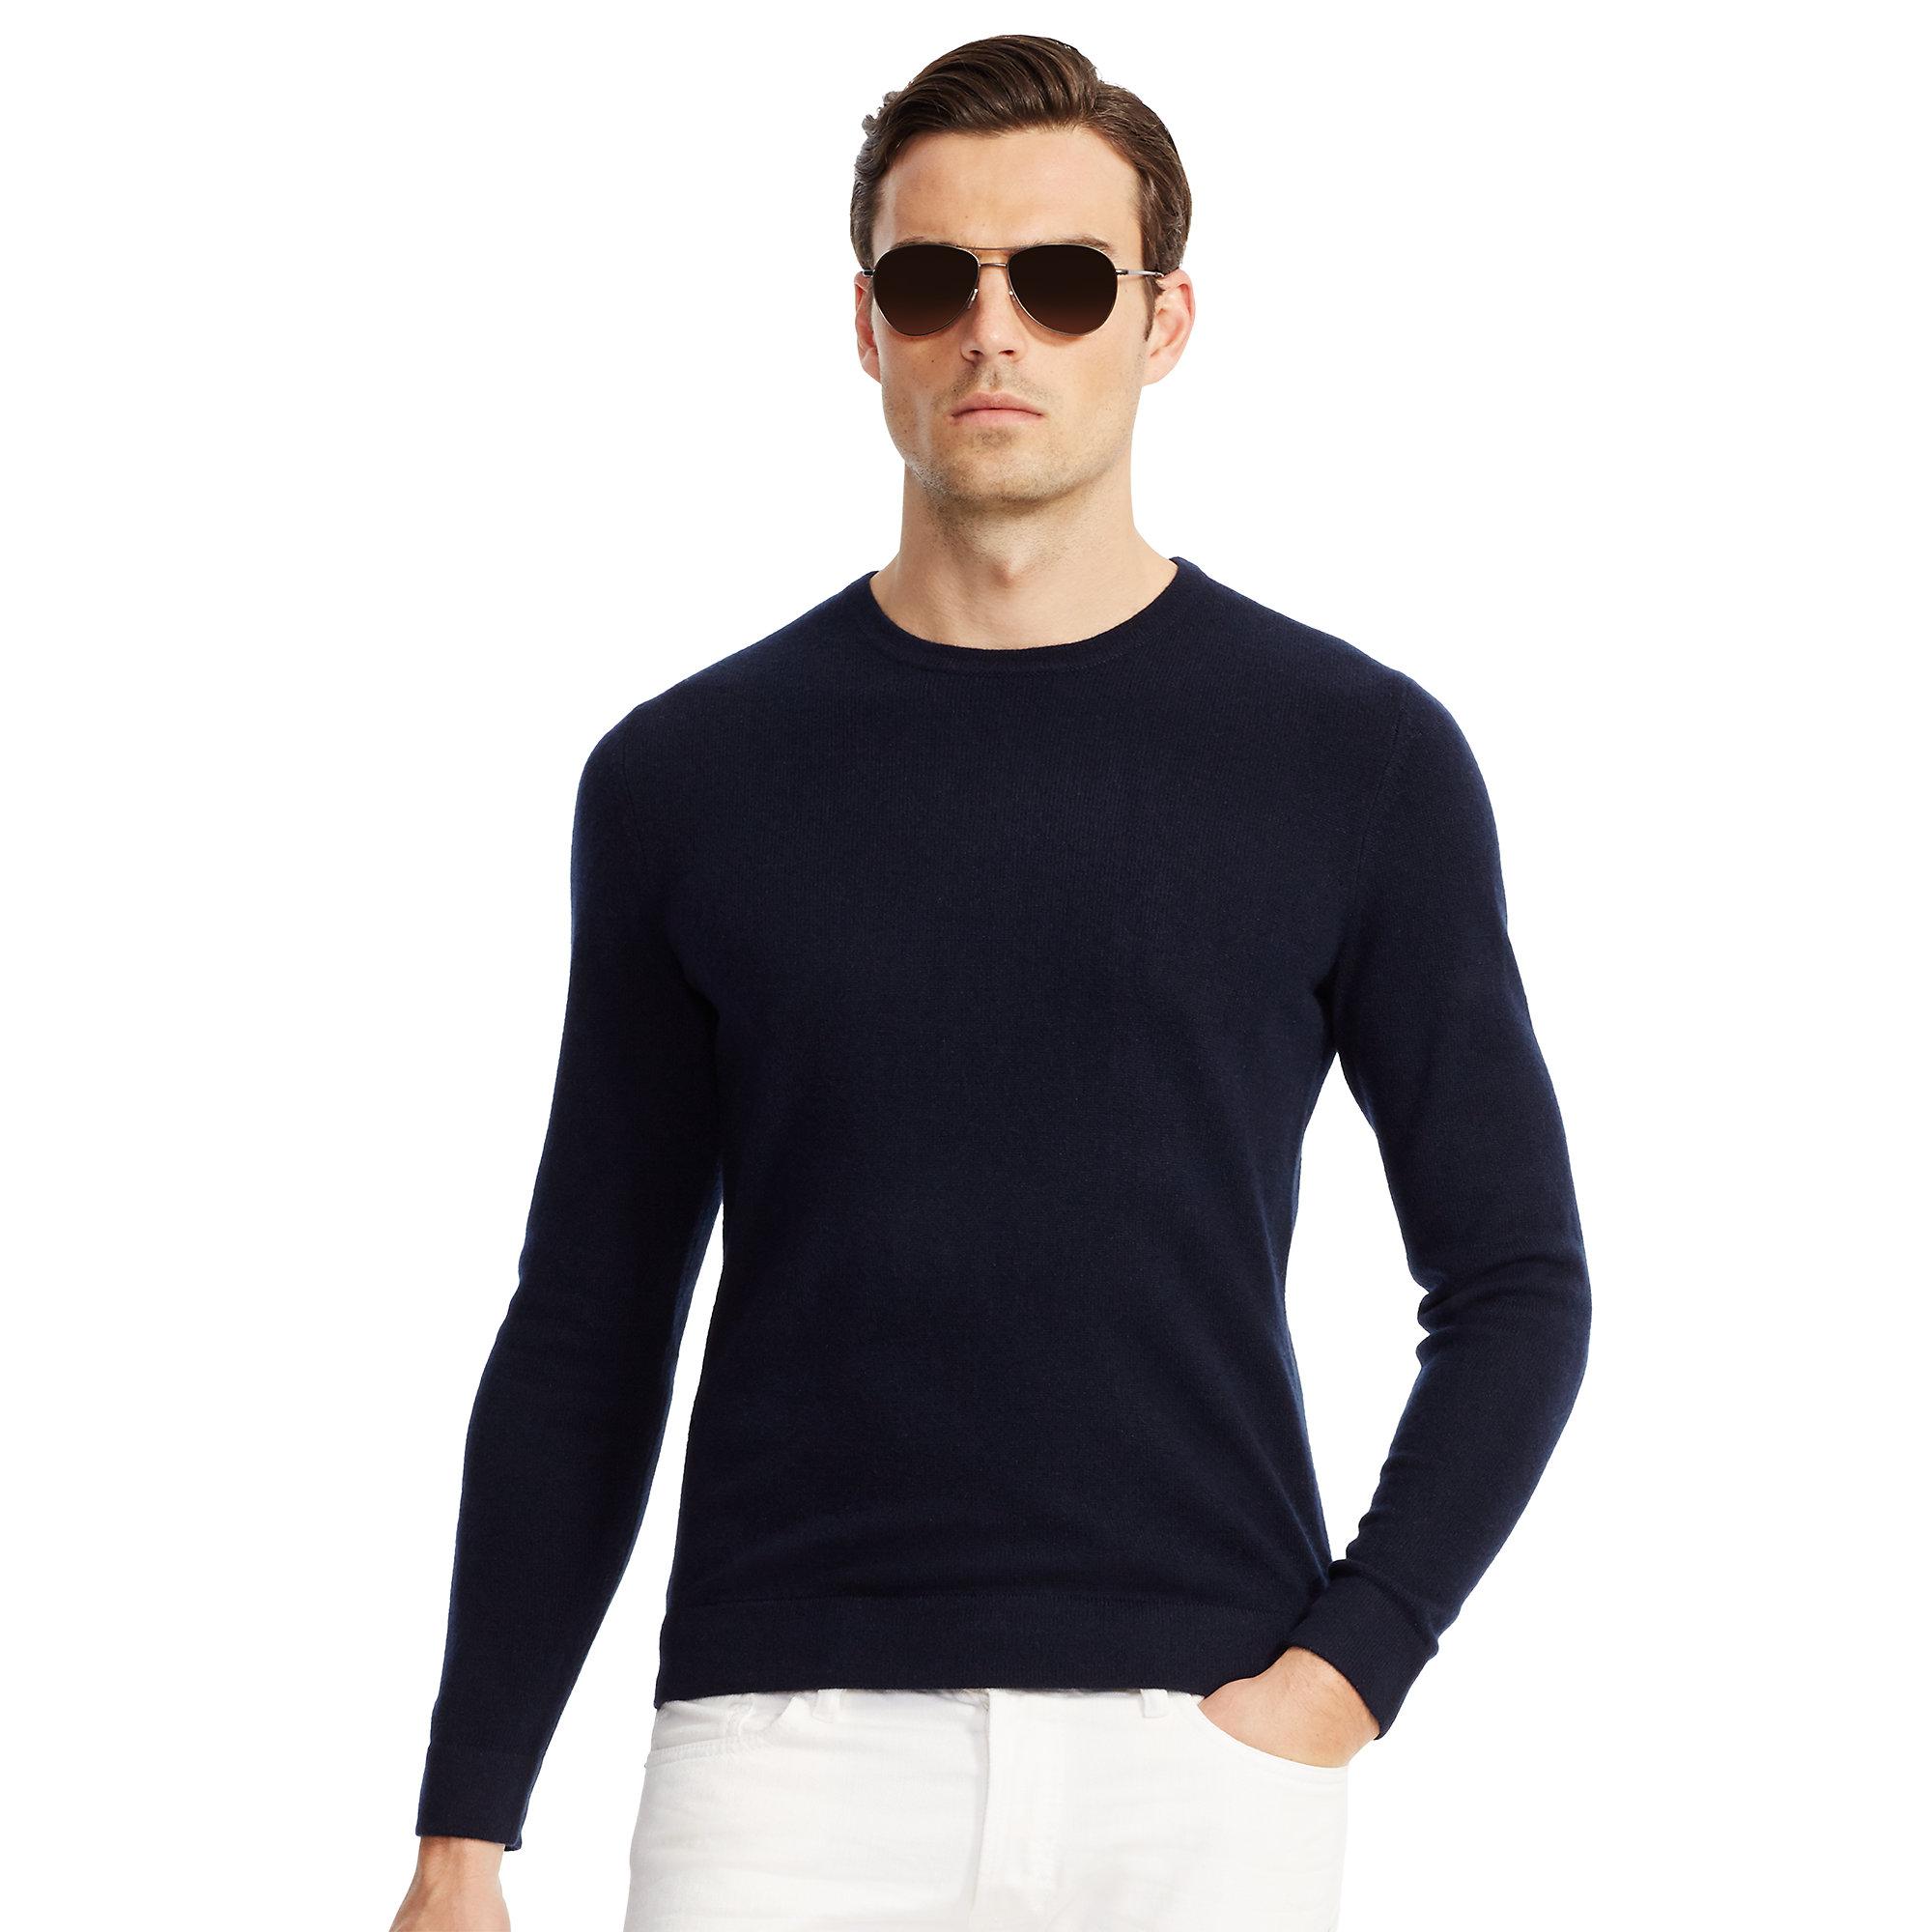 Mens Black Cashmere Crewneck Sweater